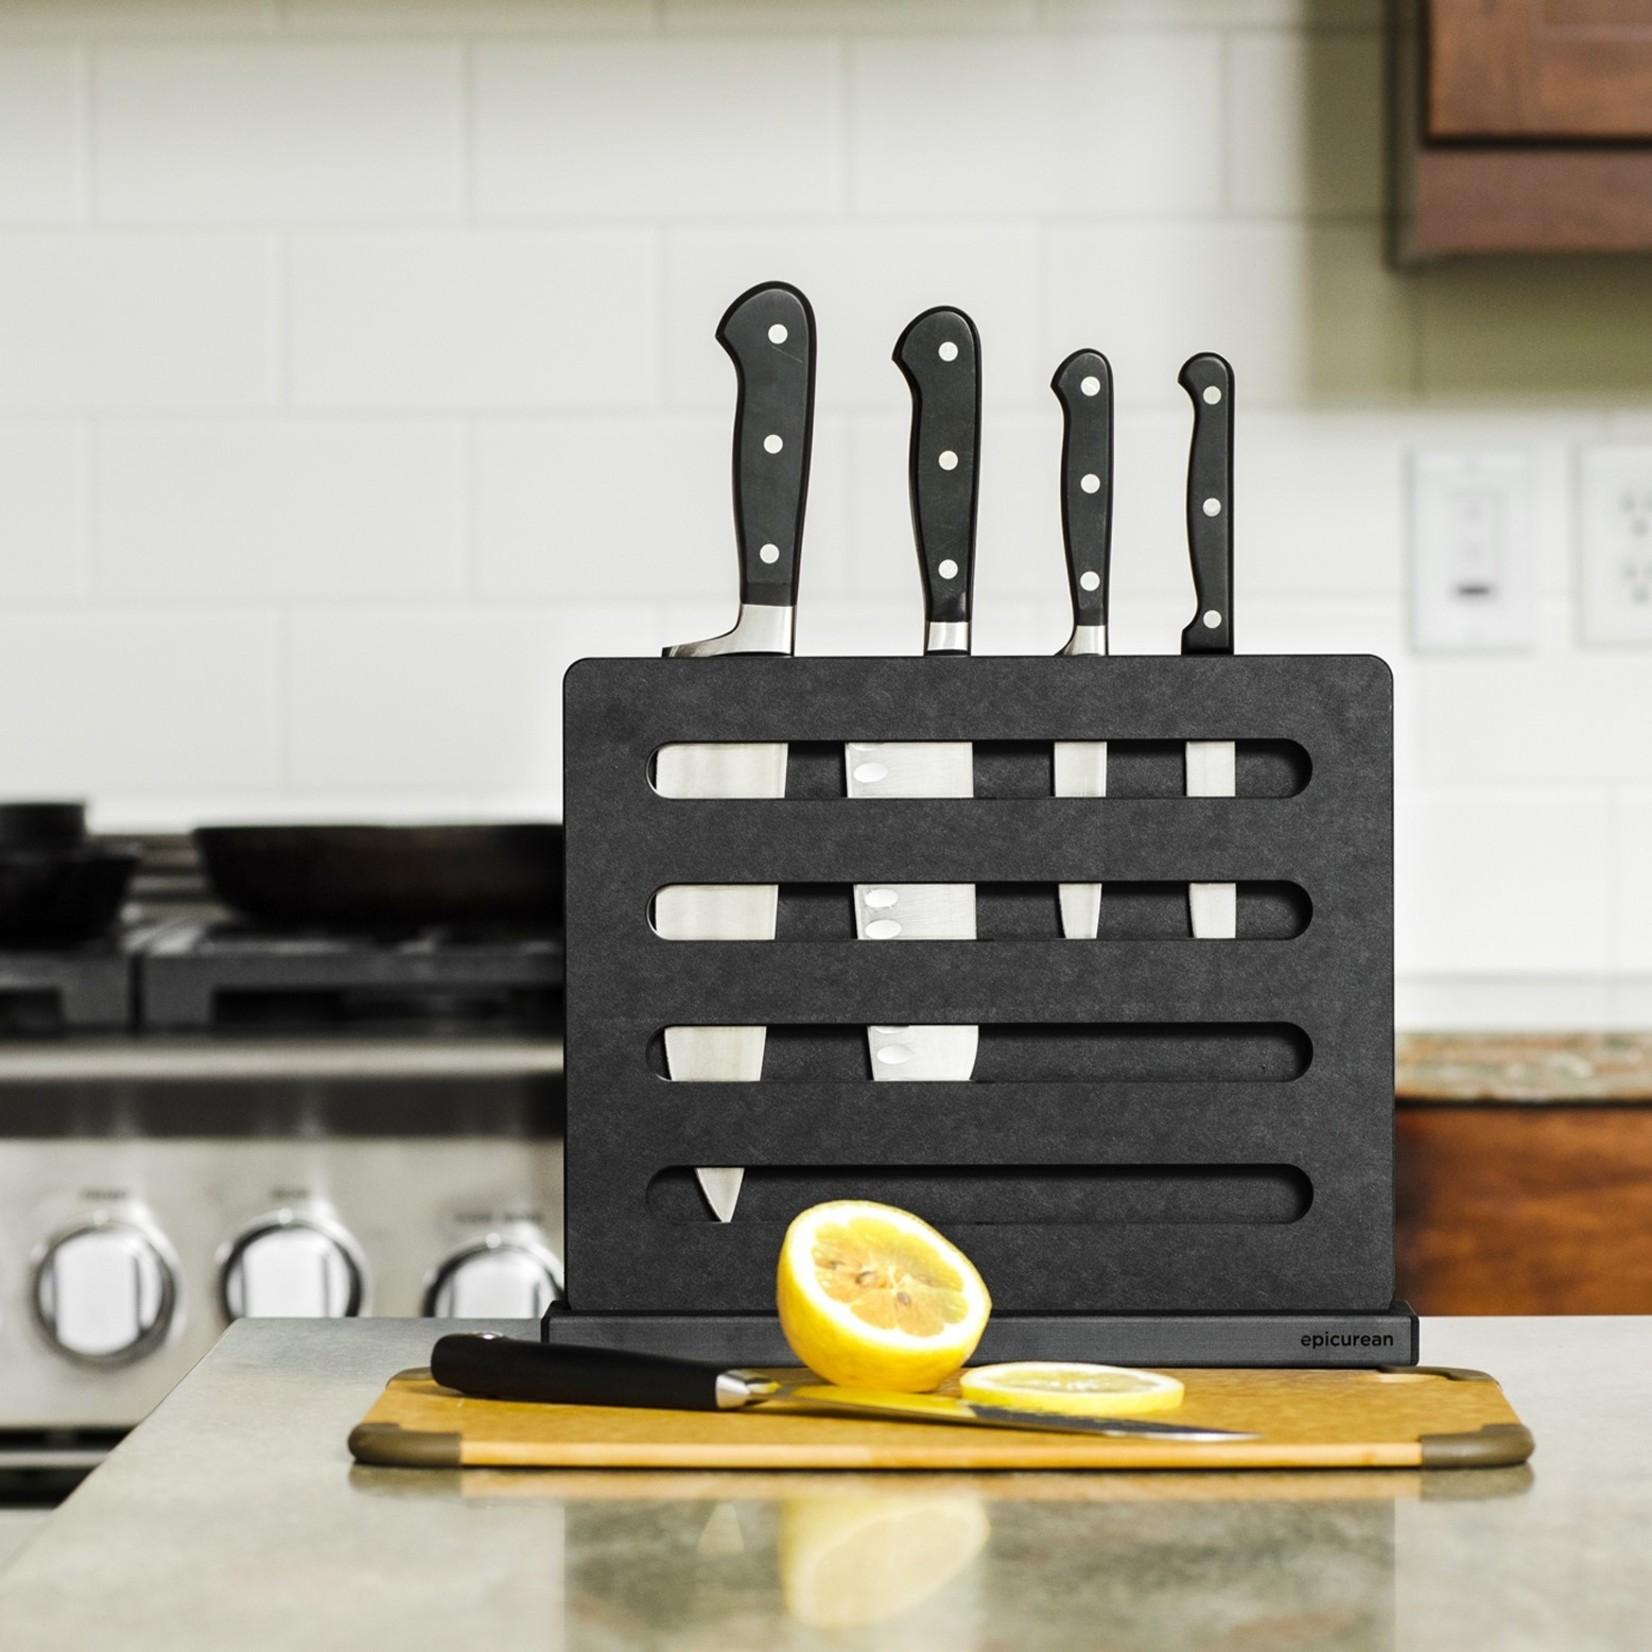 Epicurean Standing Knife Rack